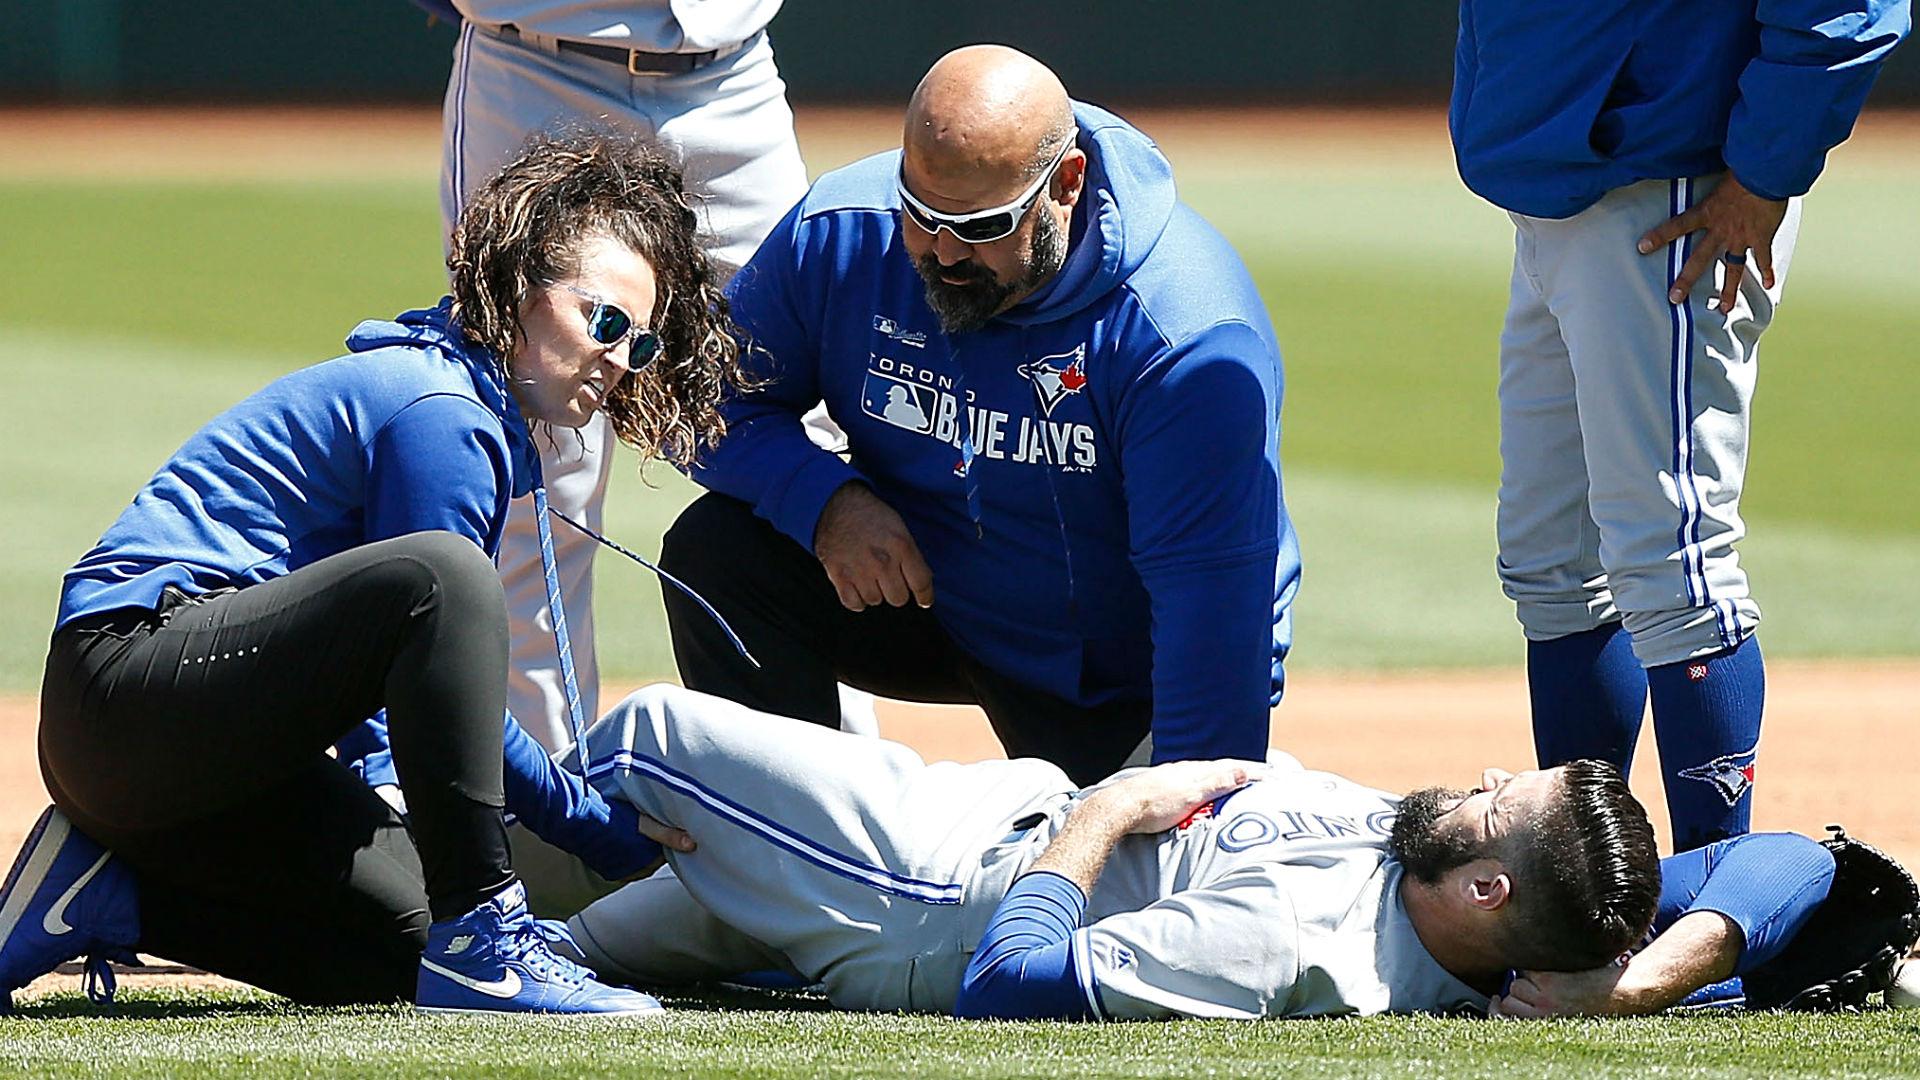 Matt Shoemaker injury update: Blue Jays starter leaves game with knee injury